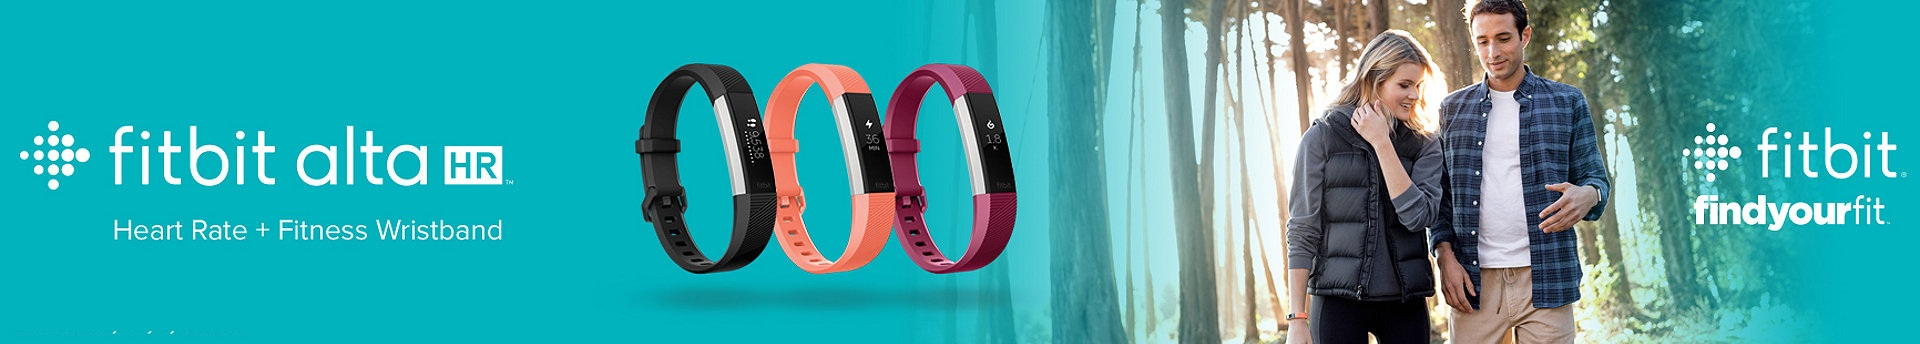 Fitbit Alta HR - Heart Rate + Wristband - Small - Black - إشتري الأن